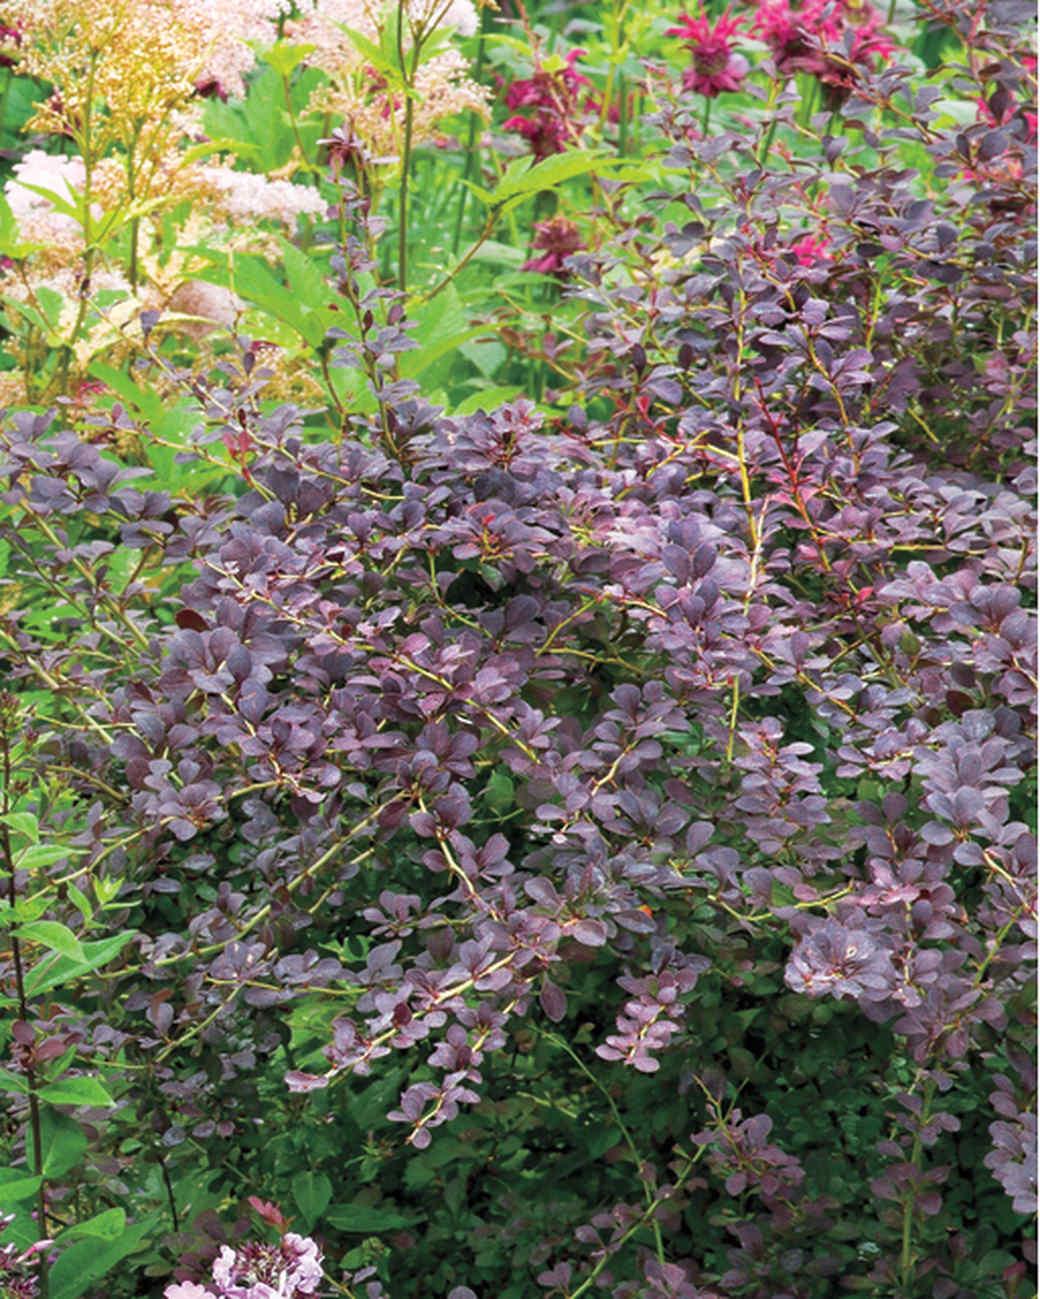 noble-garden-neutrals-mld106284.jpg